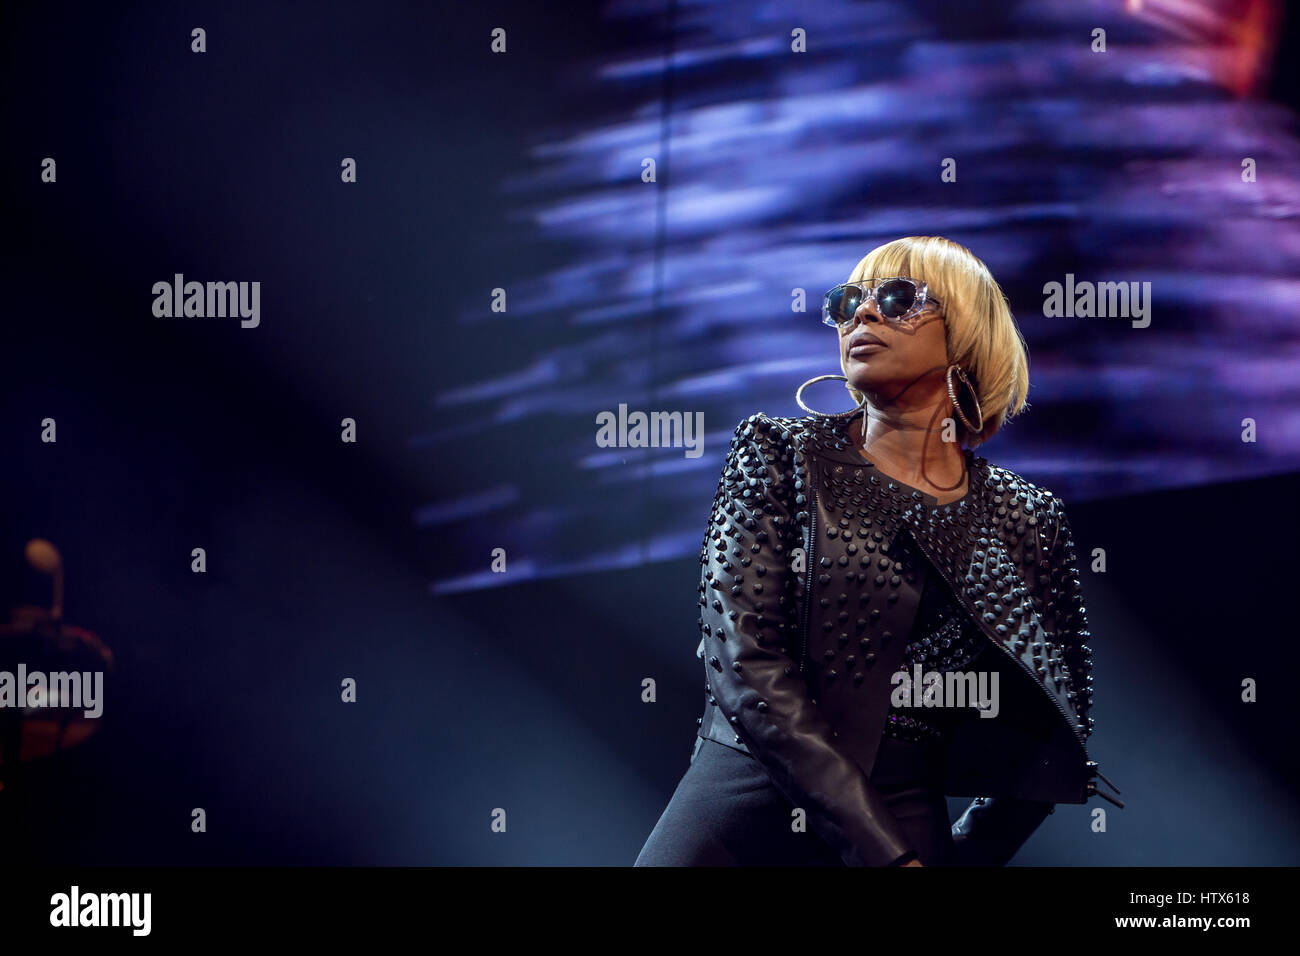 R&B Soul singer Mary J. Blige performs in Toronto November 14th, 2016 - Stock Image